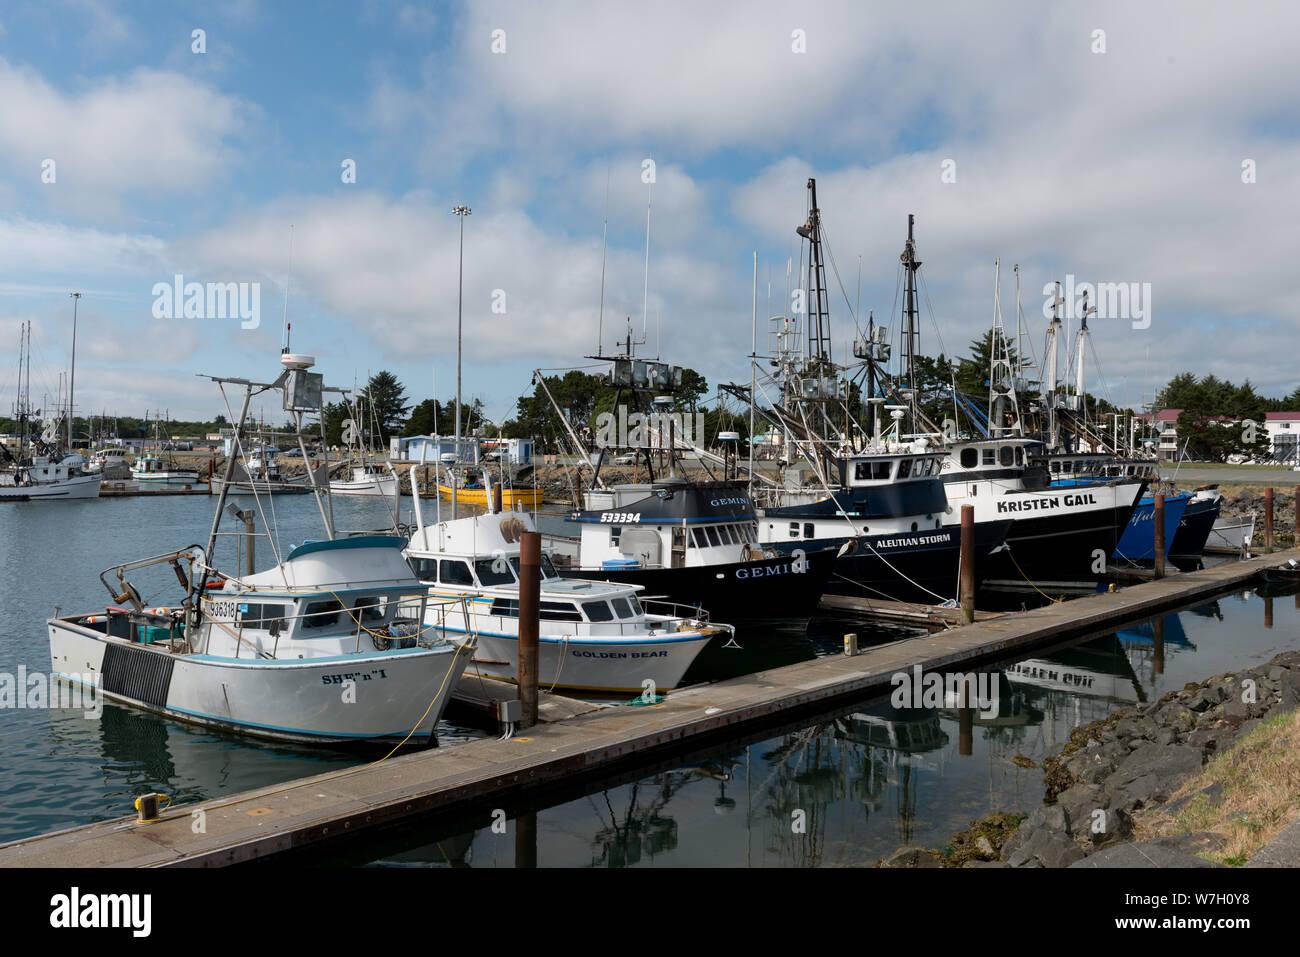 Boat marina in Crescent City, California Stock Photo